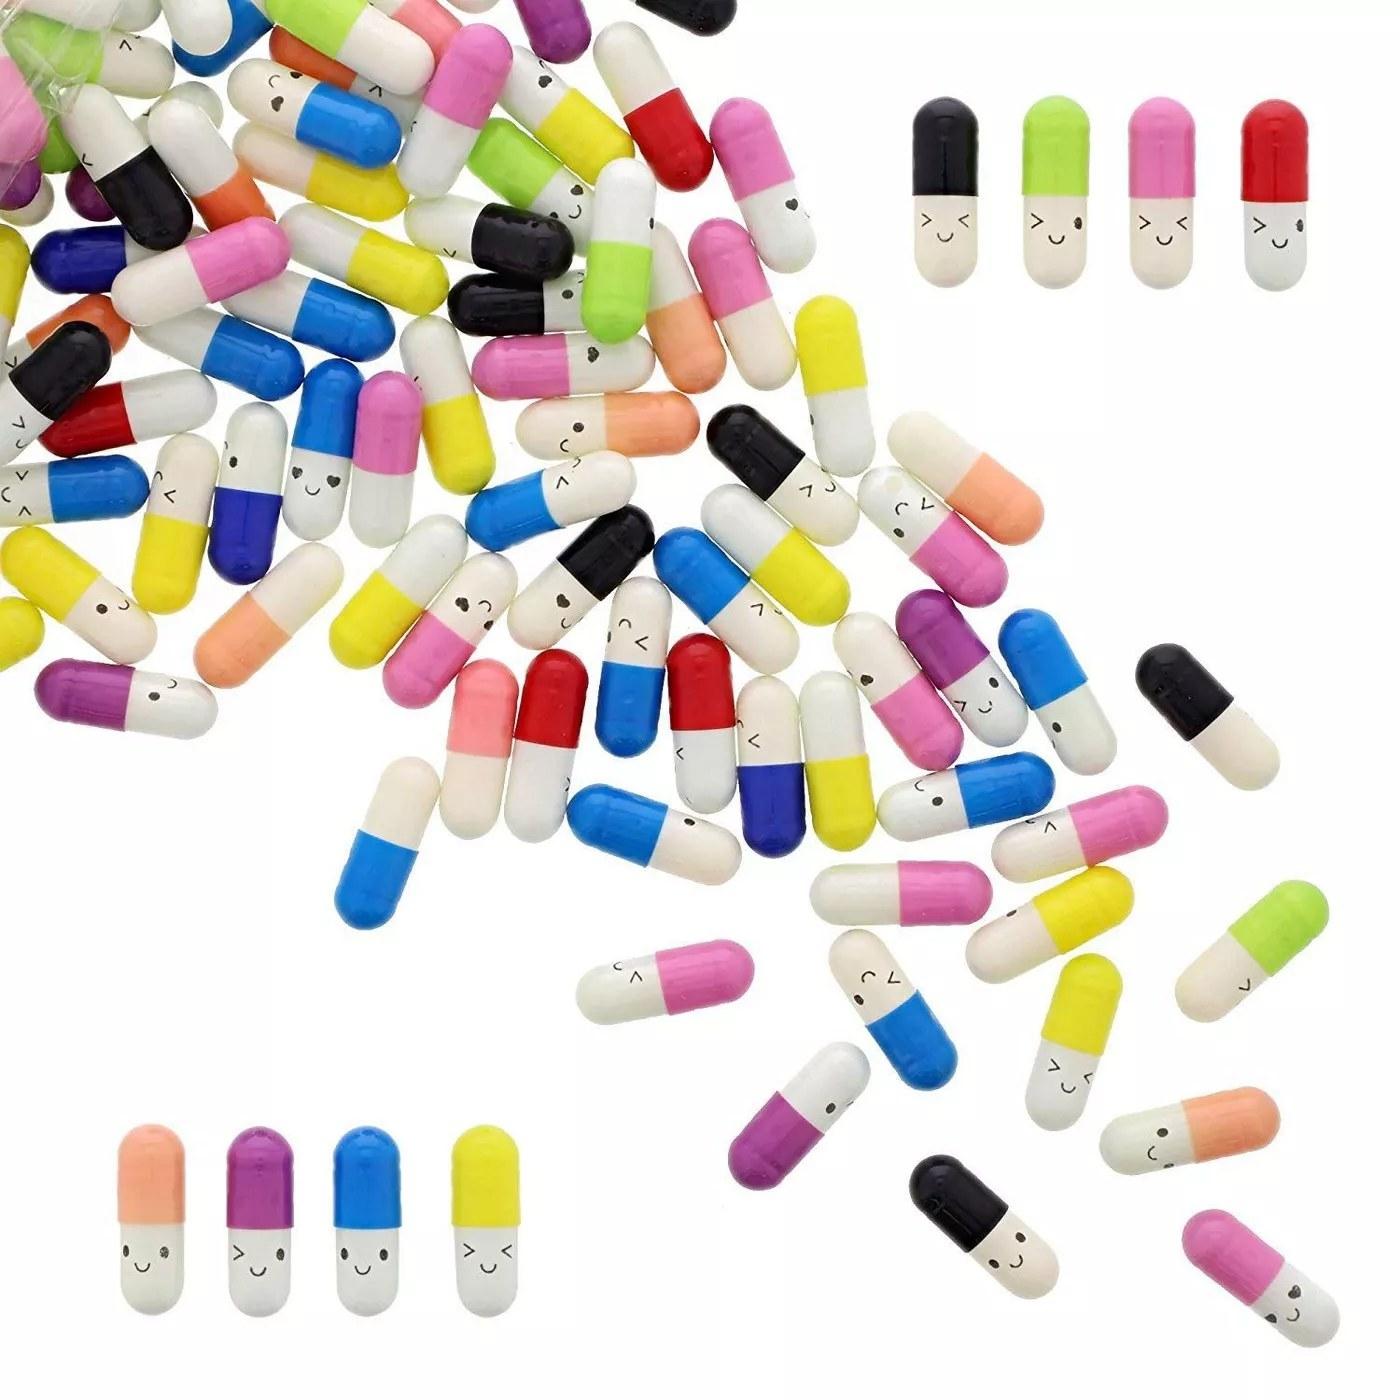 The multi-colored letter capsules